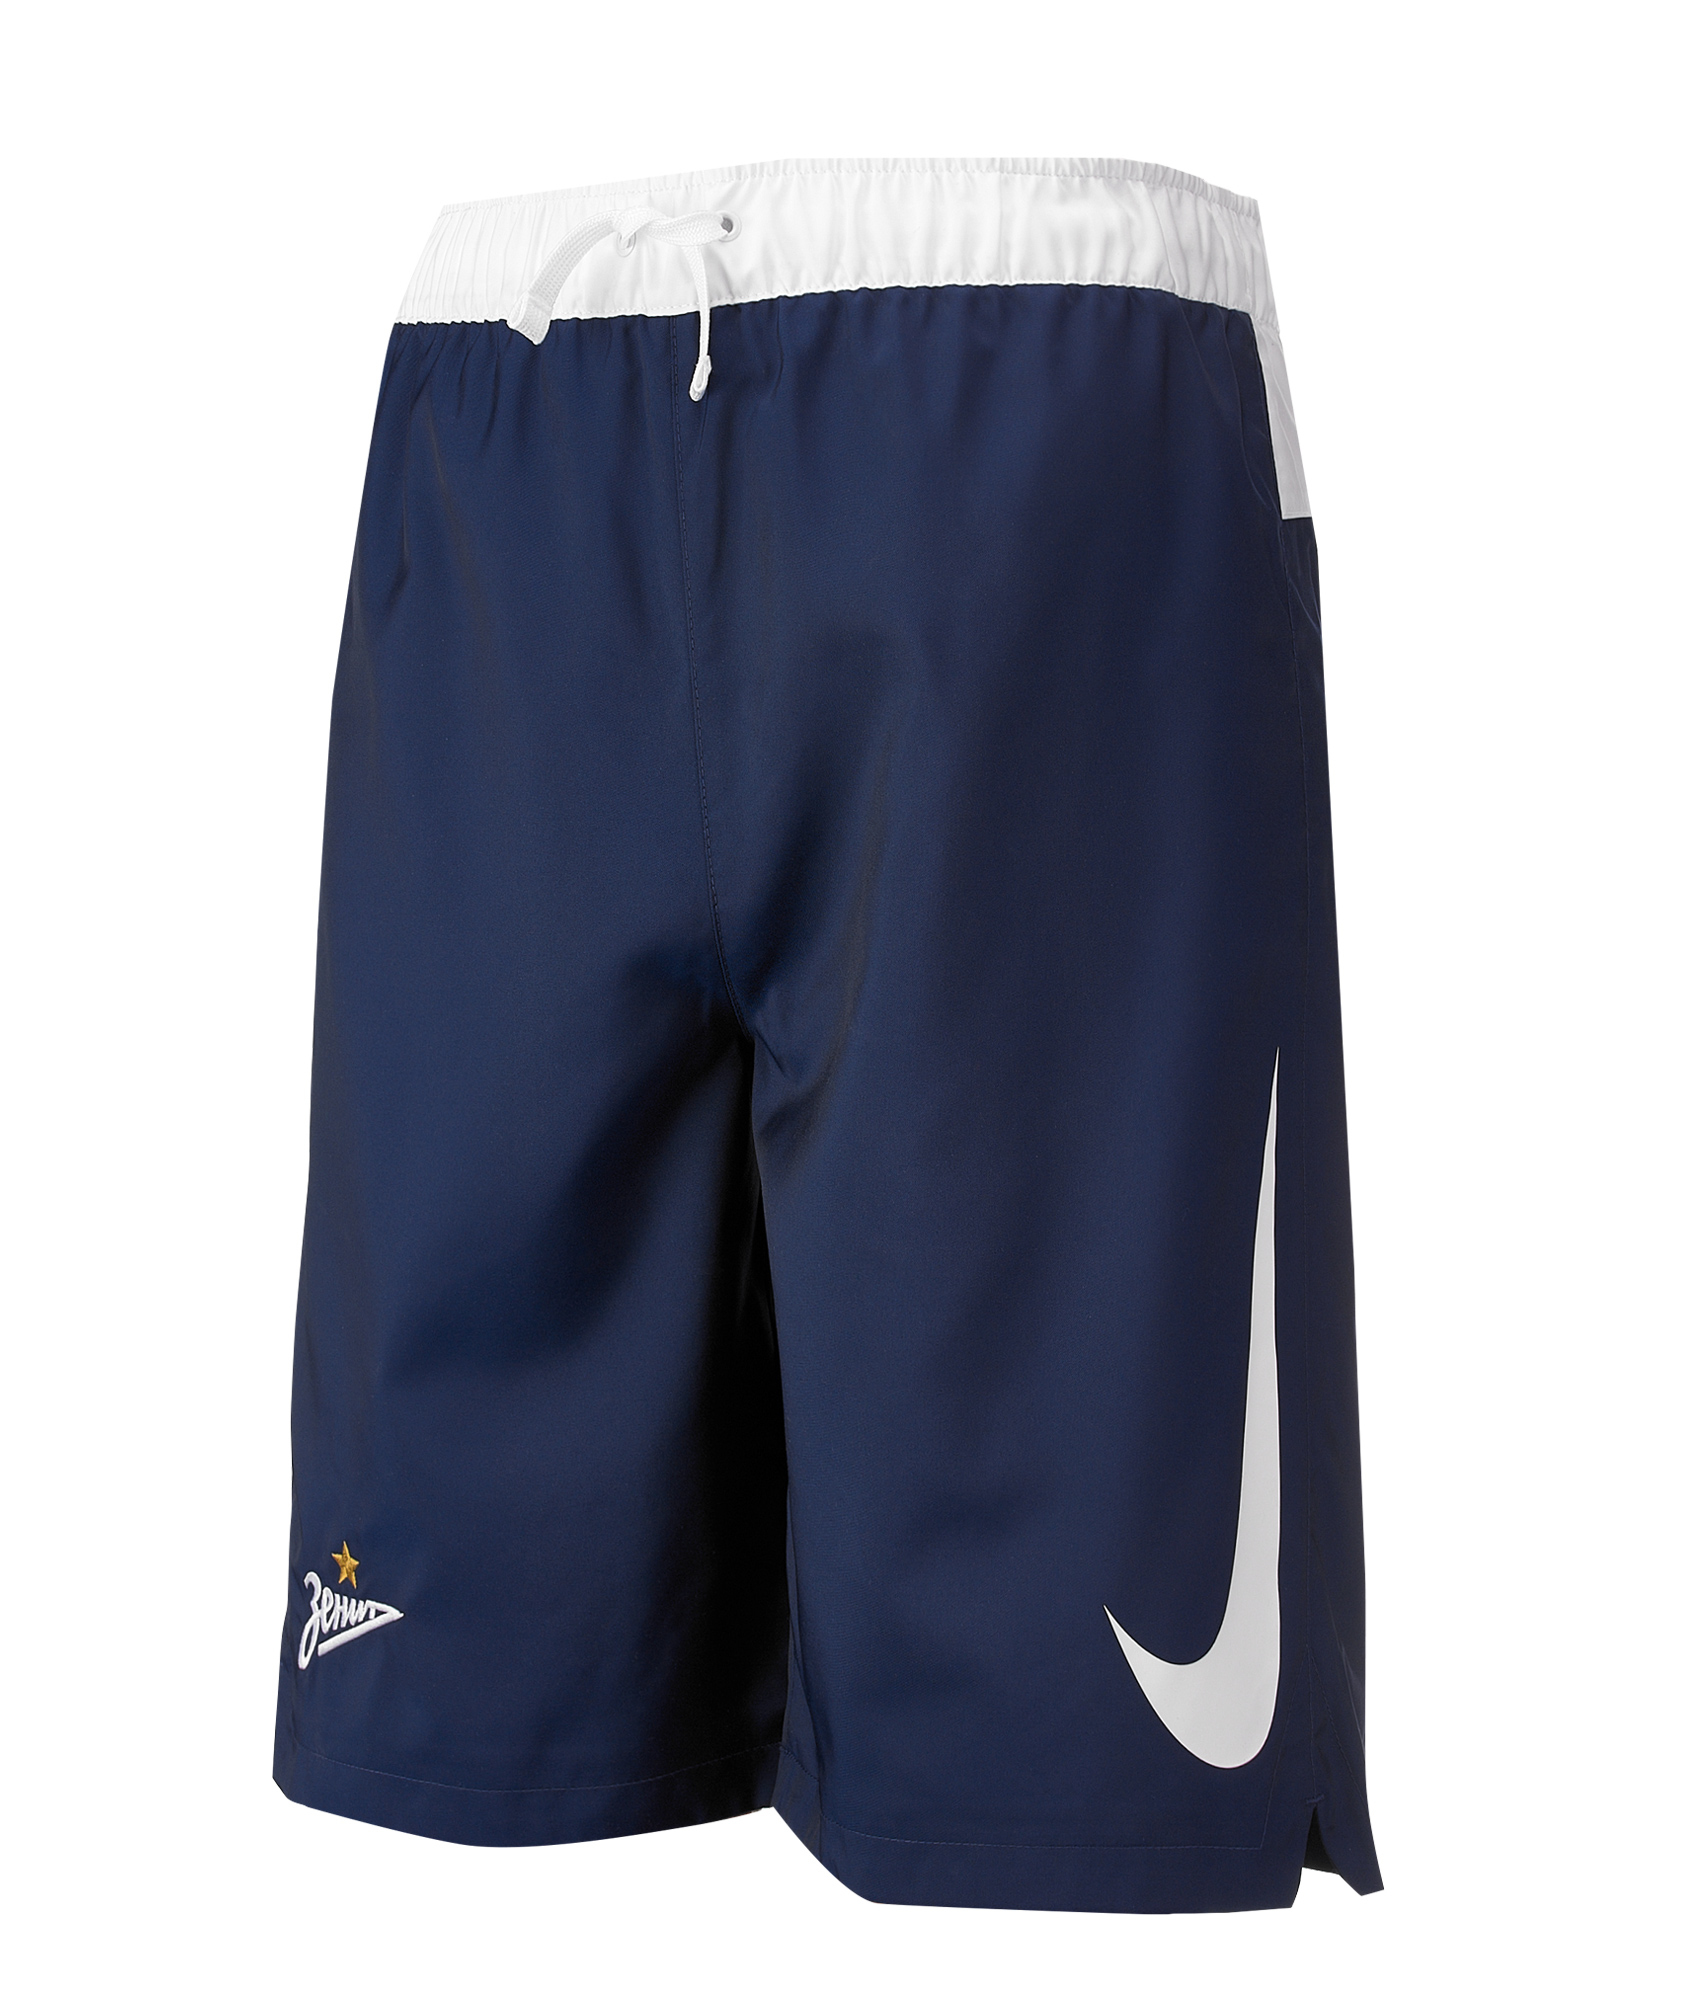 Шорты подростковые Nike Nike Цвет-Синий цена и фото